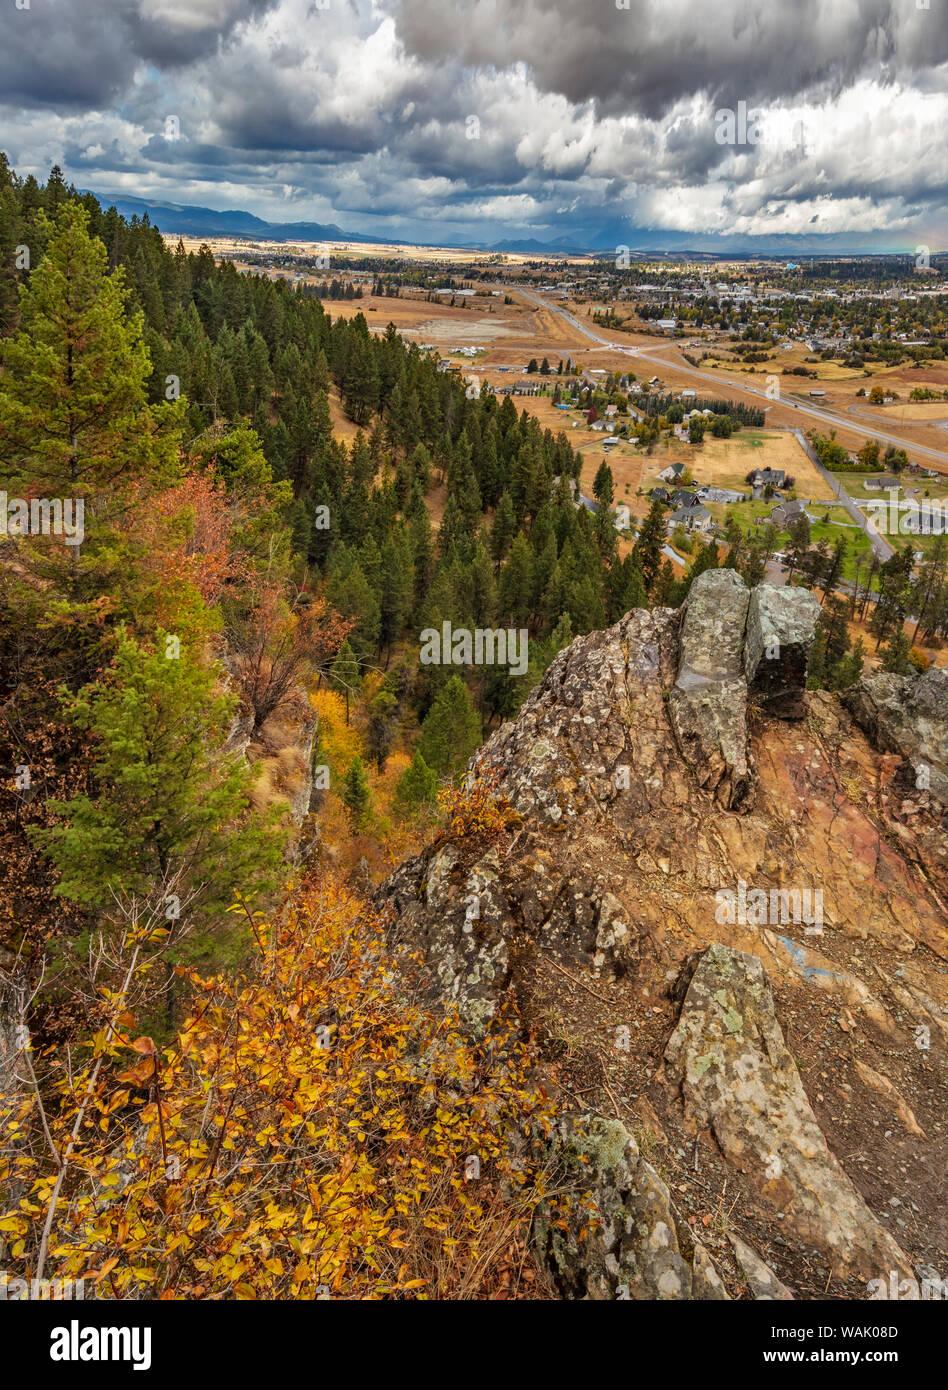 Kalispell Montana Stock Photos & Kalispell Montana Stock